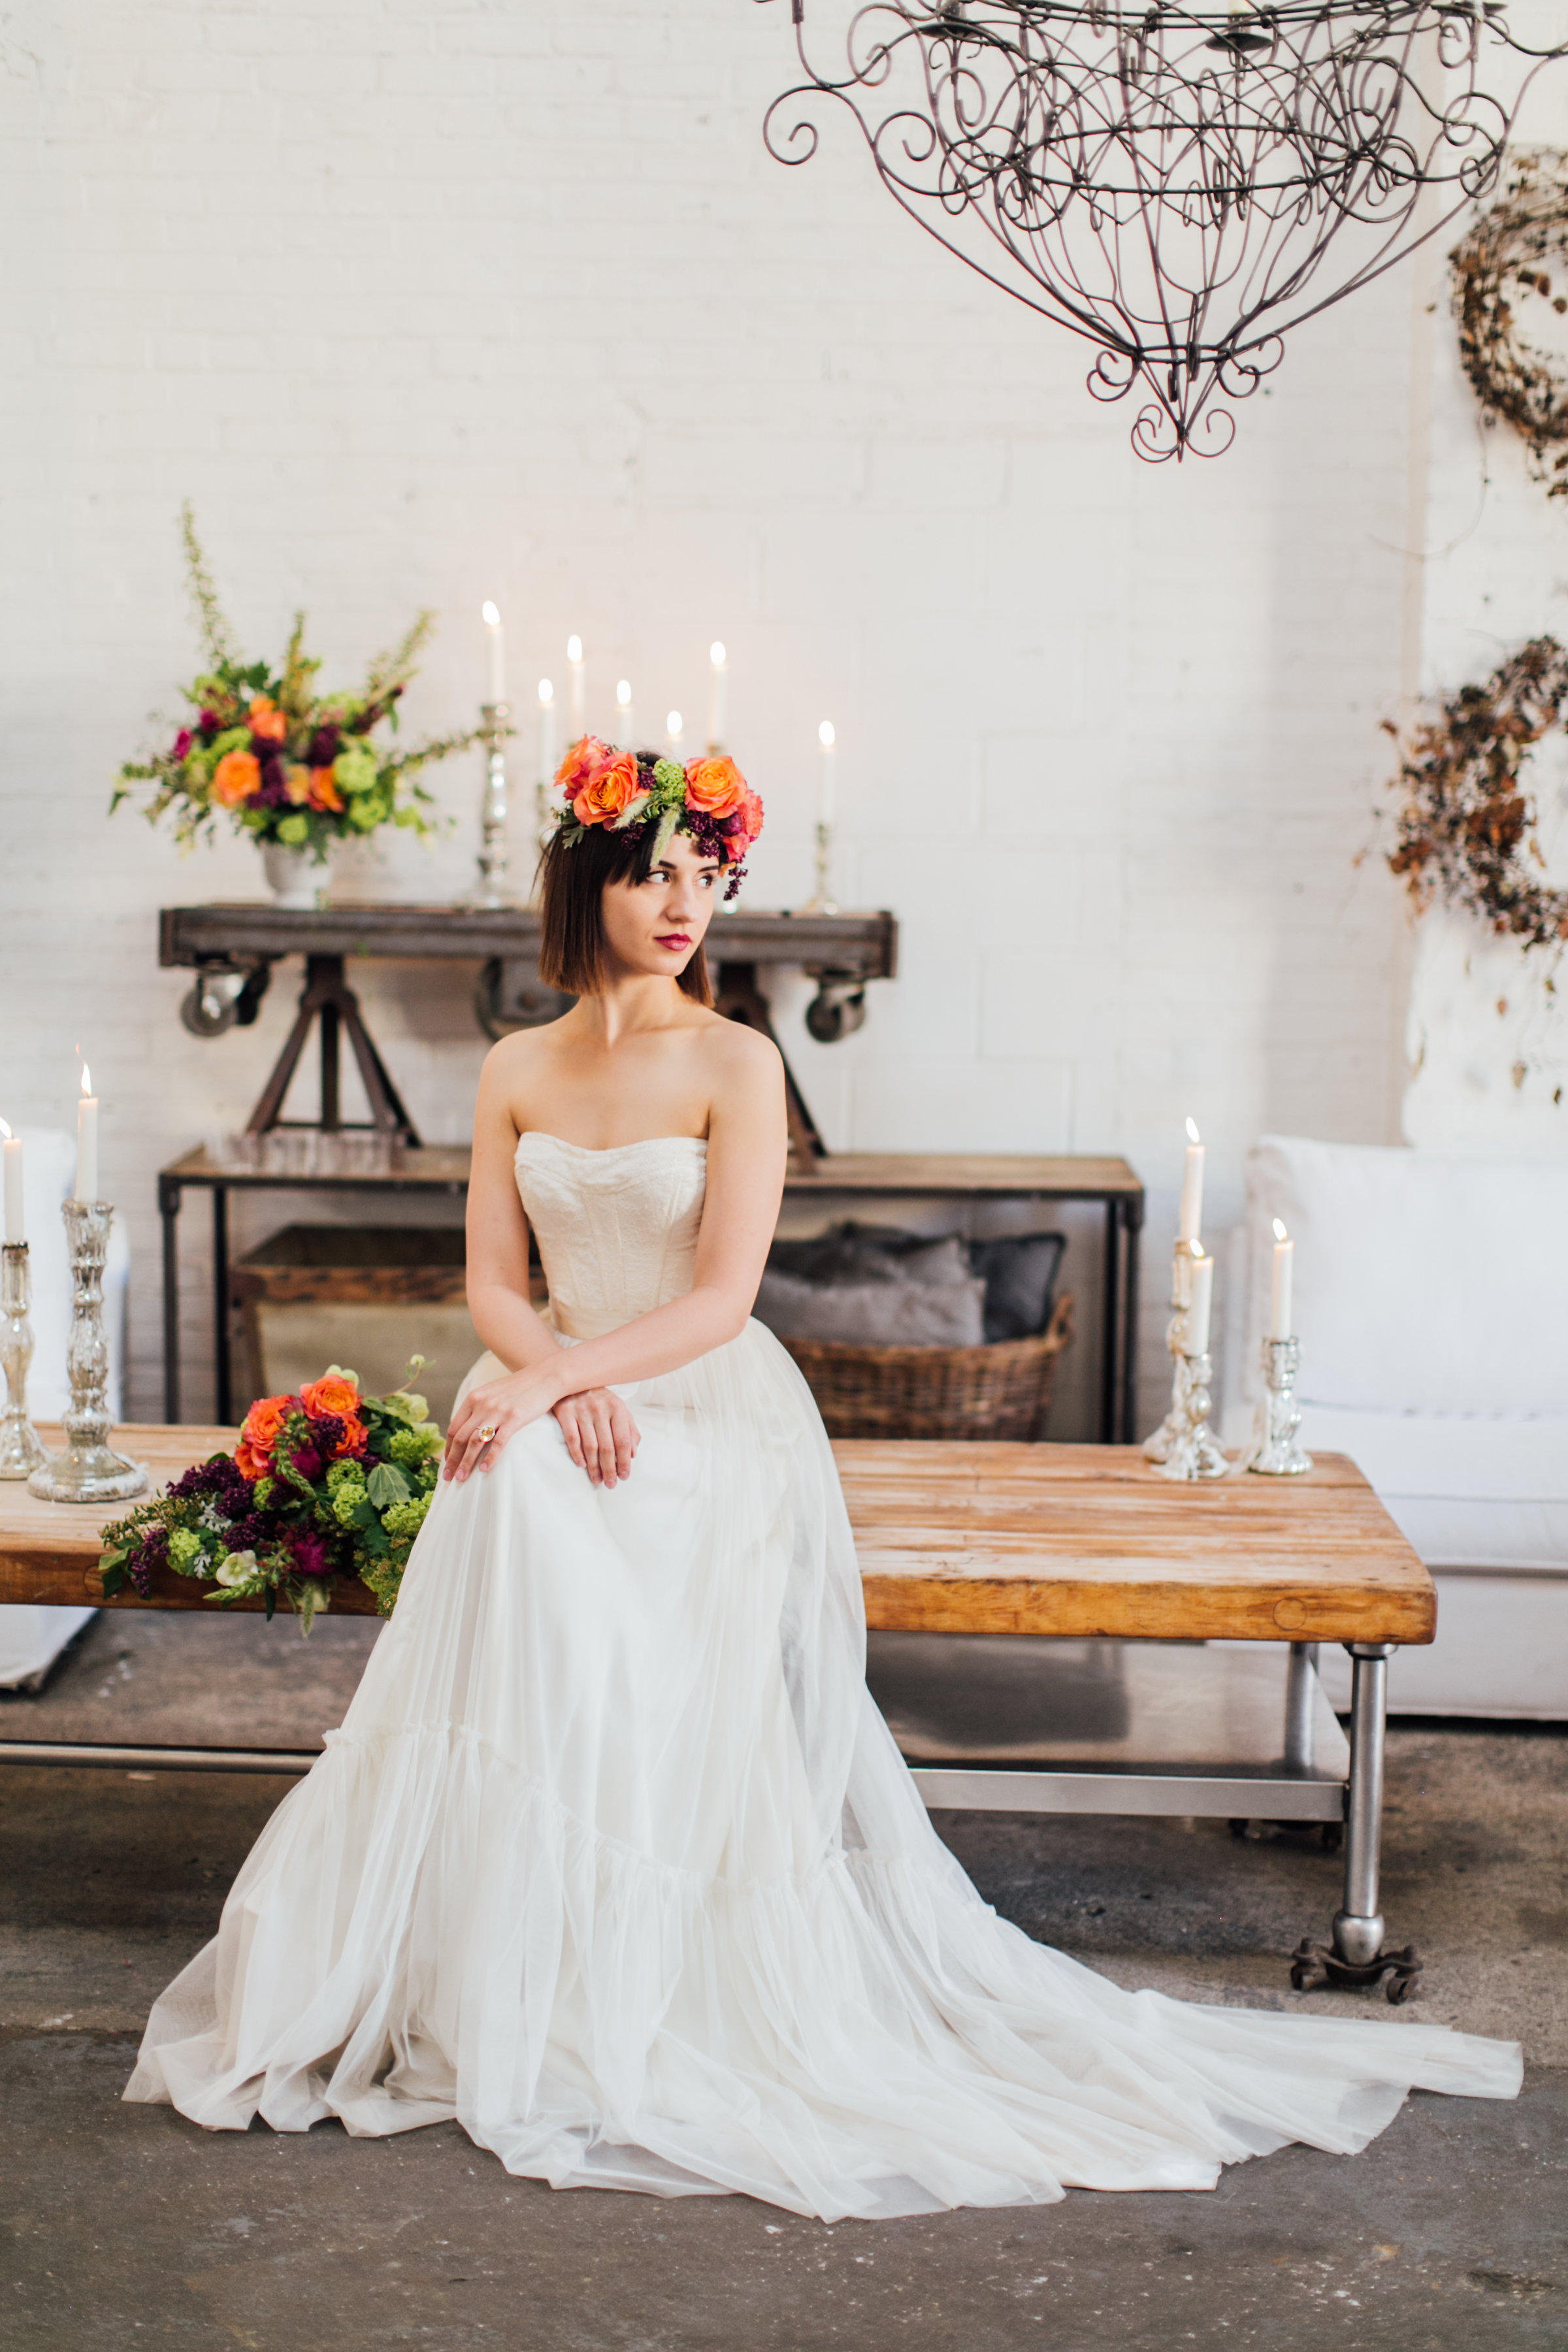 111_NYC-wedding-photographer-Amber-Marlow.jpg